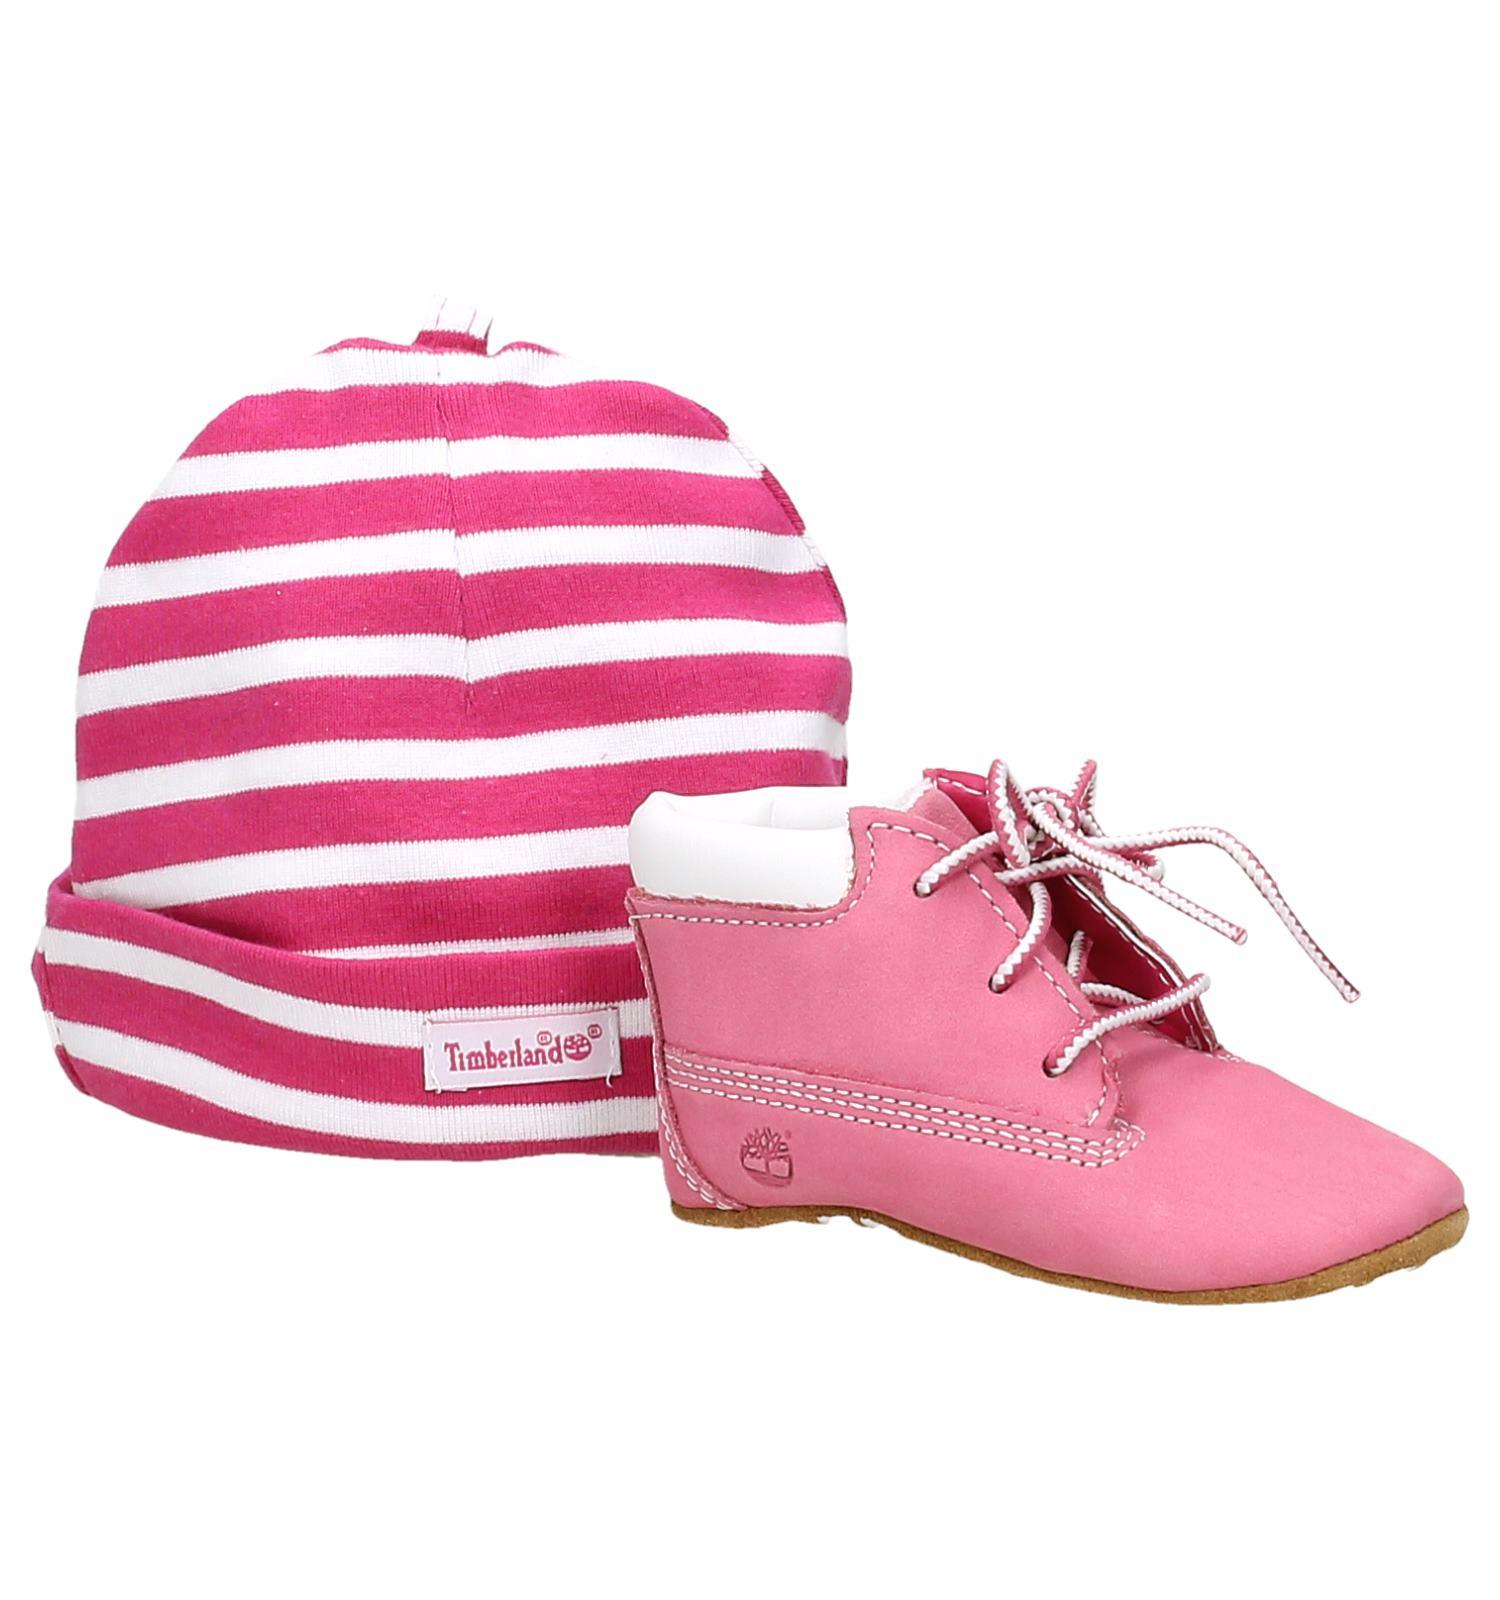 Timberland babyschoenen roze